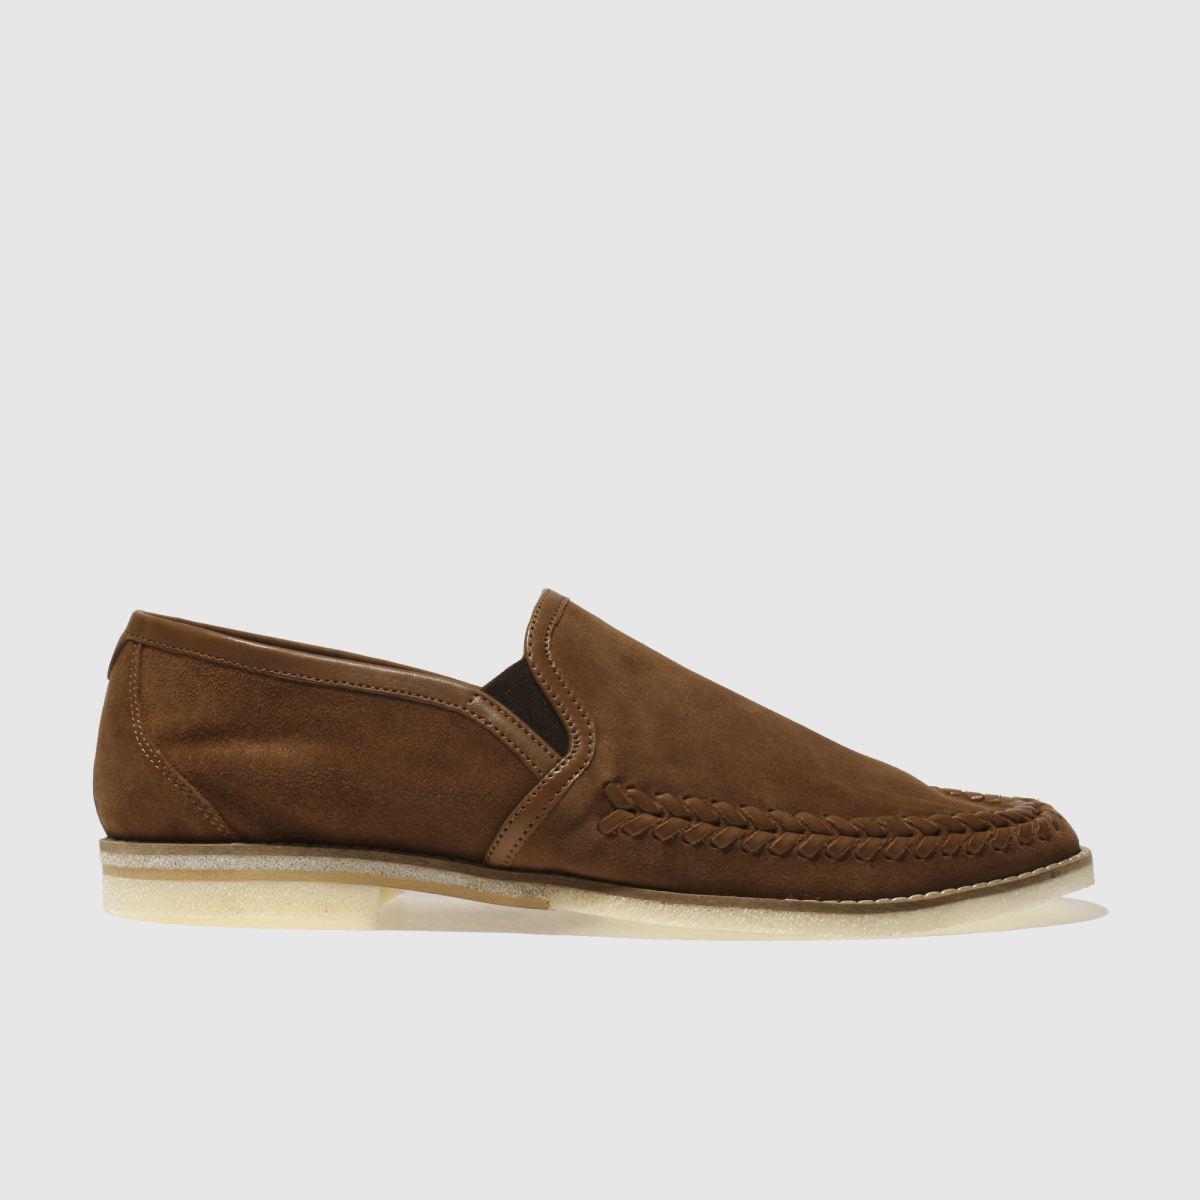 H By Hudson Tan Alderburgh Shoes